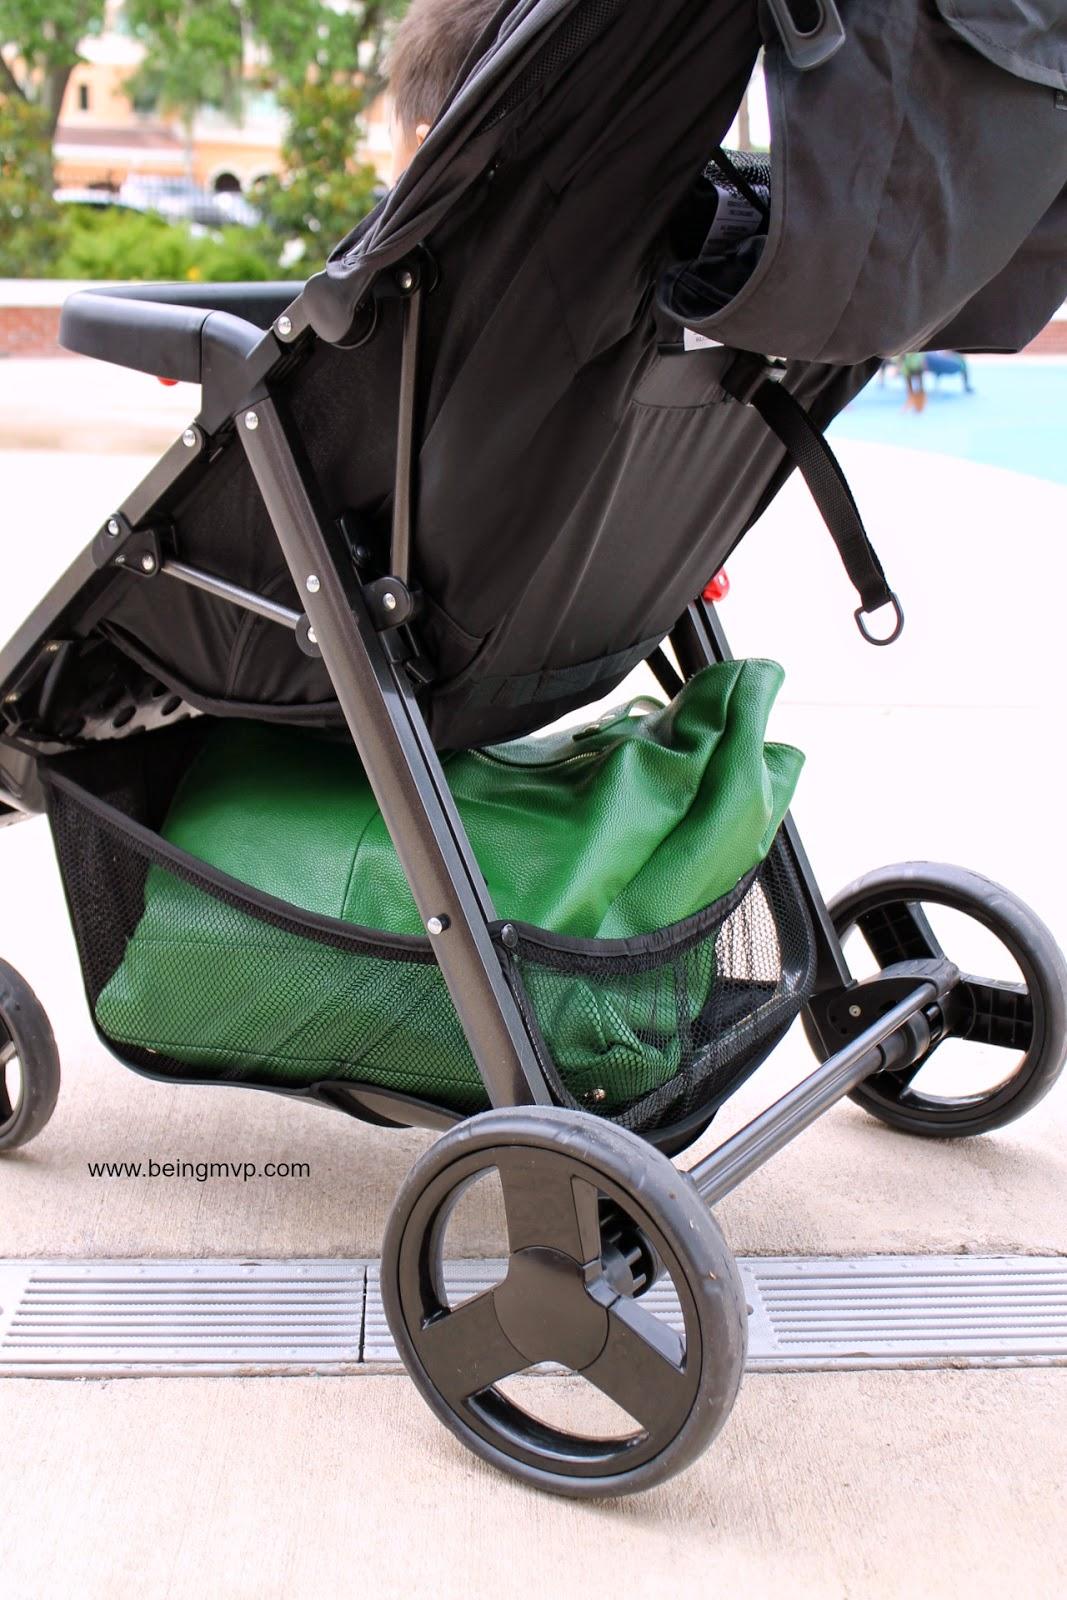 ef756e7b031 being MVP  Combi Fold   Go Stroller +  Giveaway